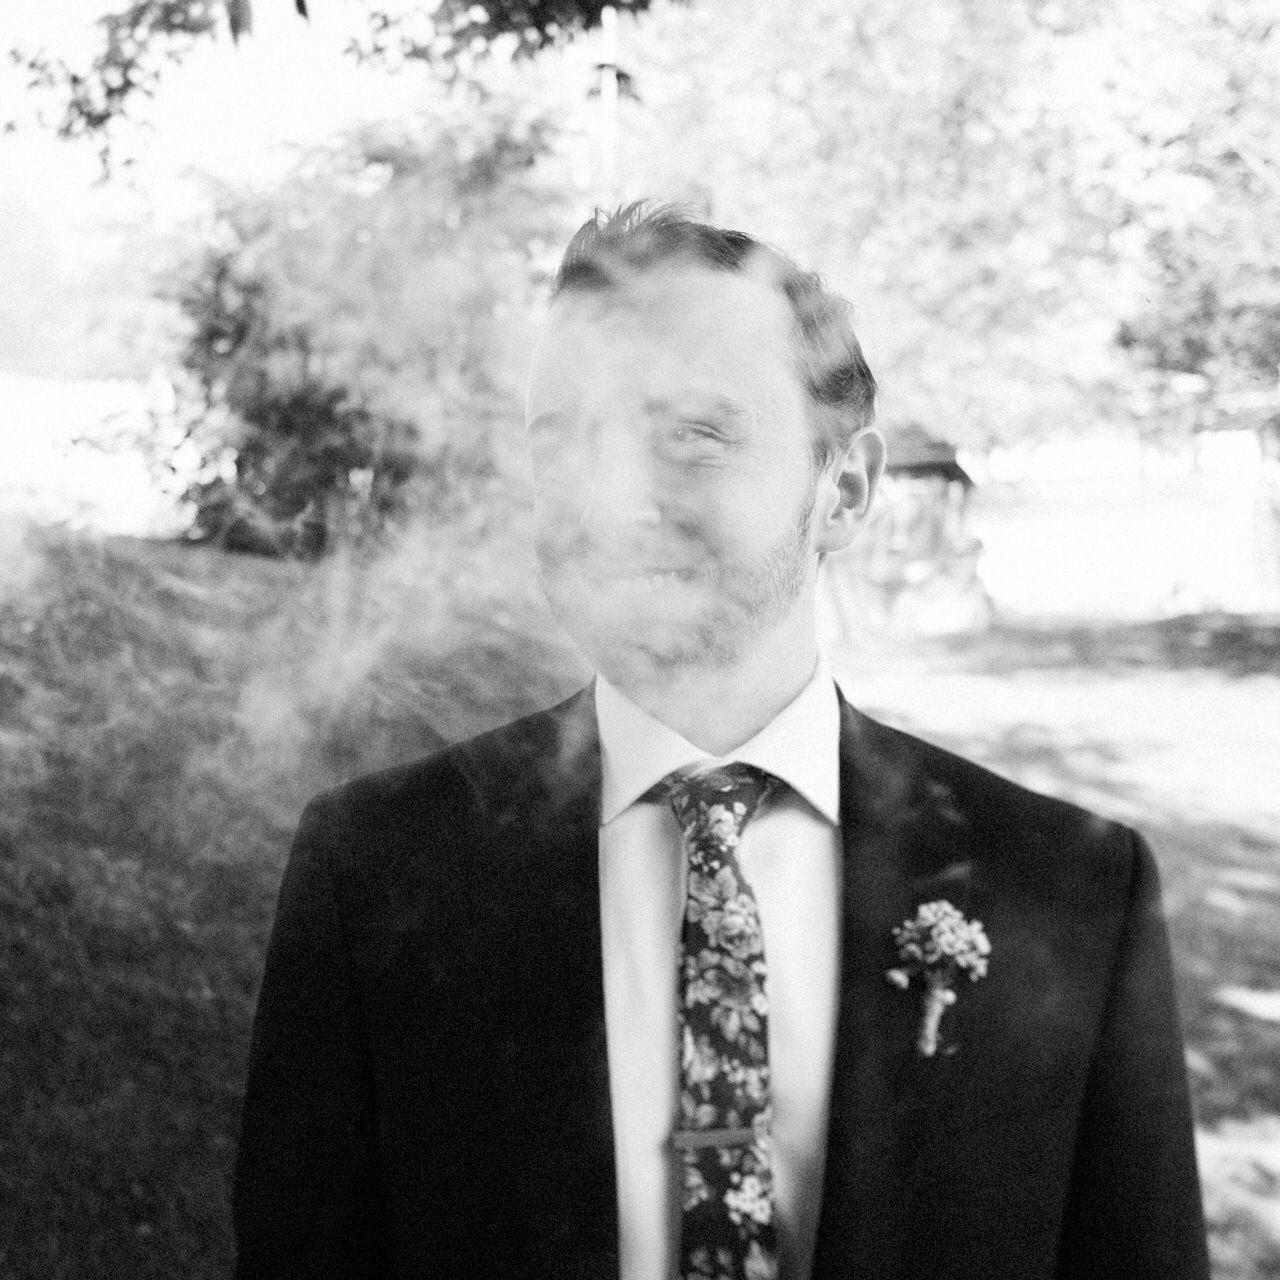 Hip groom smoking portrait.jpg